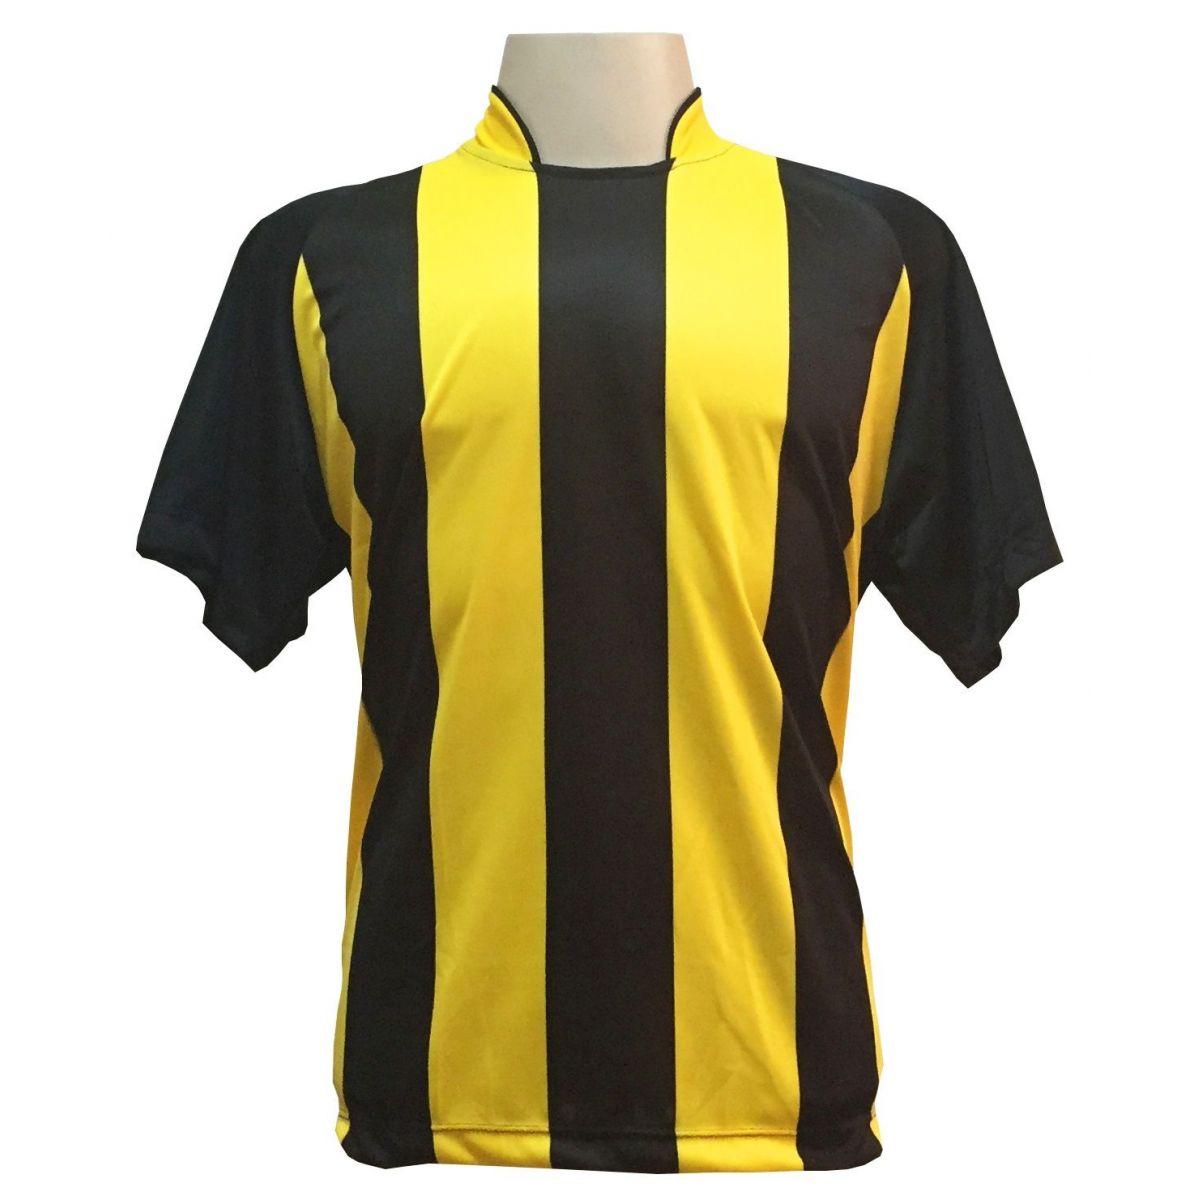 Uniforme Completo modelo Milan 18+2 (18 Camisas Preto/Amarelo + 18 Calções Modelo Copa Preto/Amarelo + 18 Pares de Meiões Pretos + 2 Conjuntos de Goleiro) + Brindes